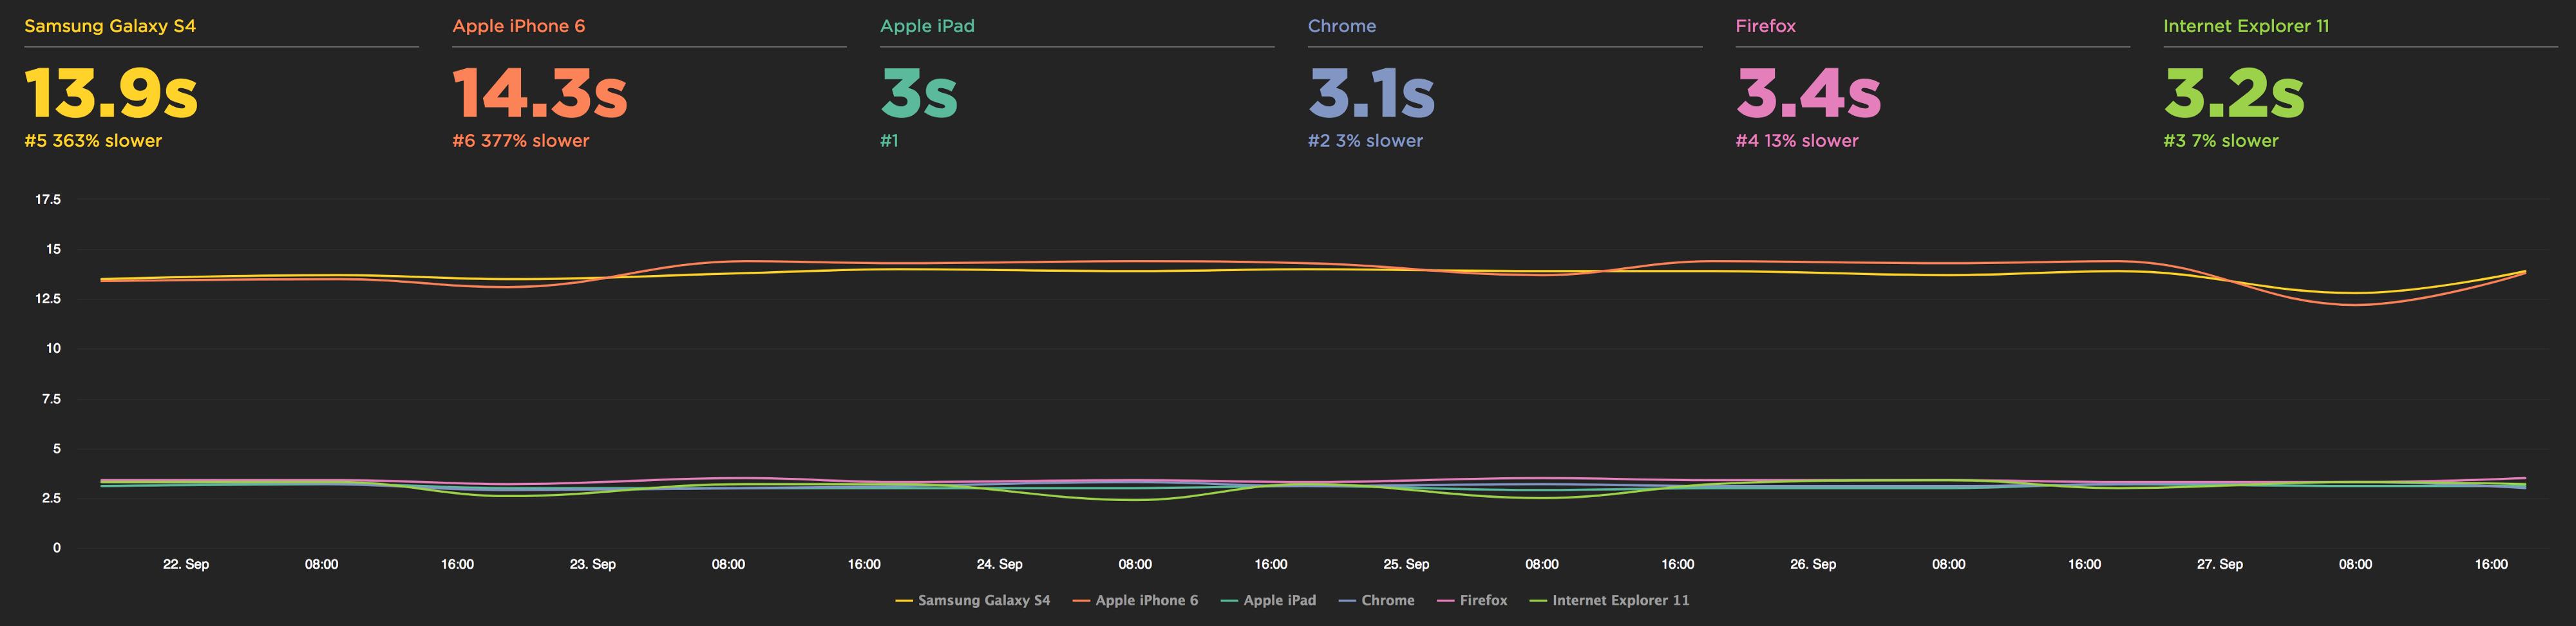 Page load image metrics